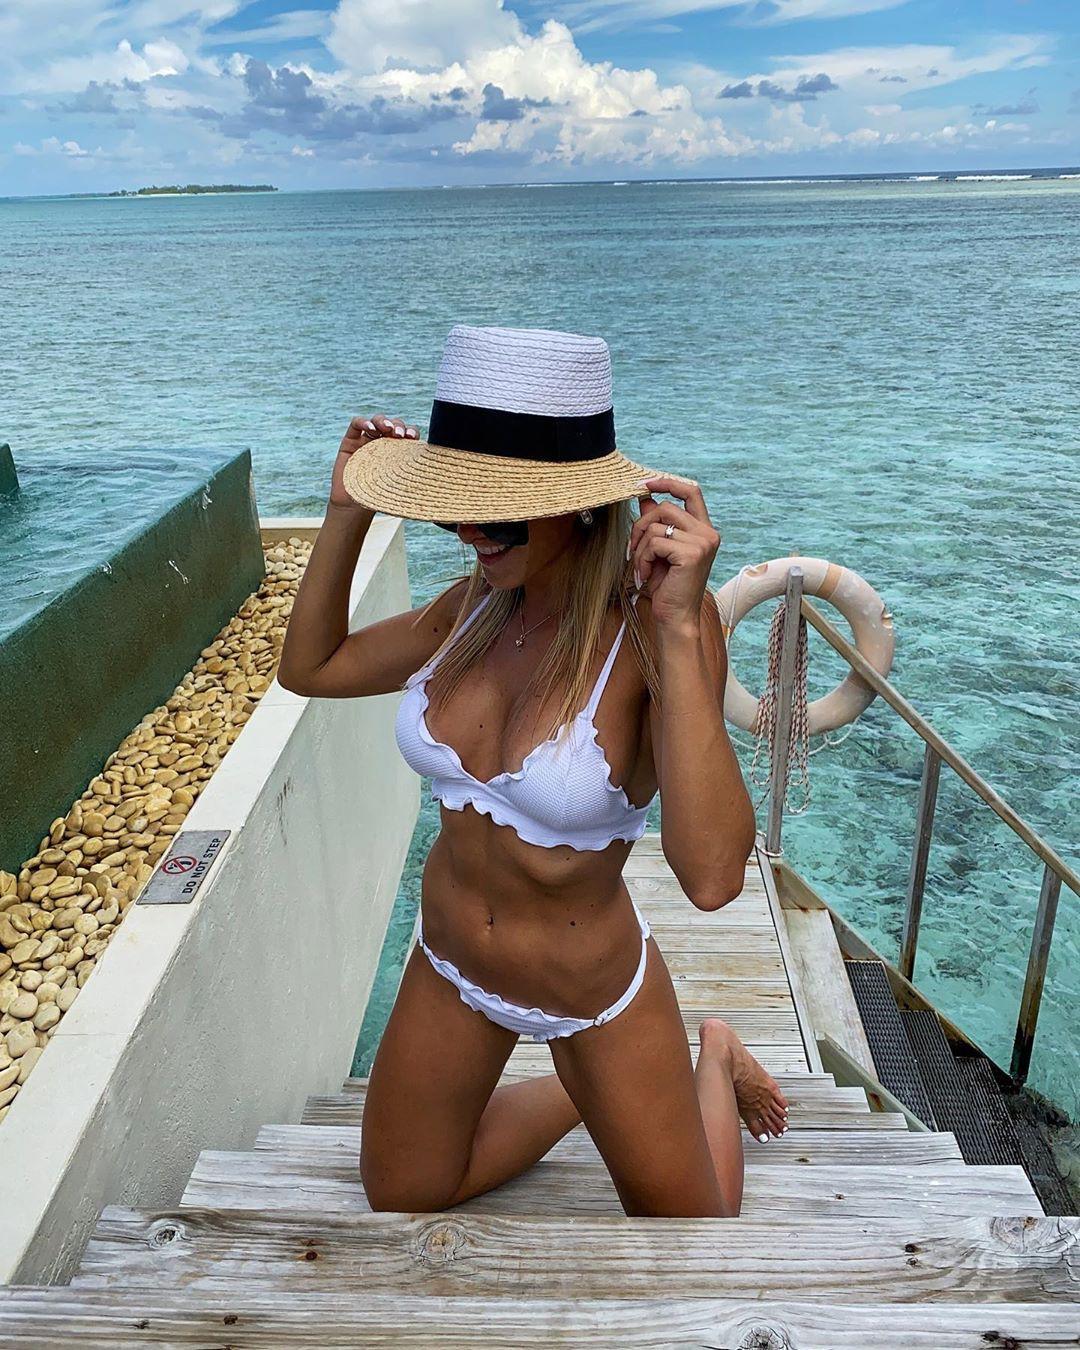 Amanda Ferguson hot pics in lingerie, bikini bodies swimwear matching outfit